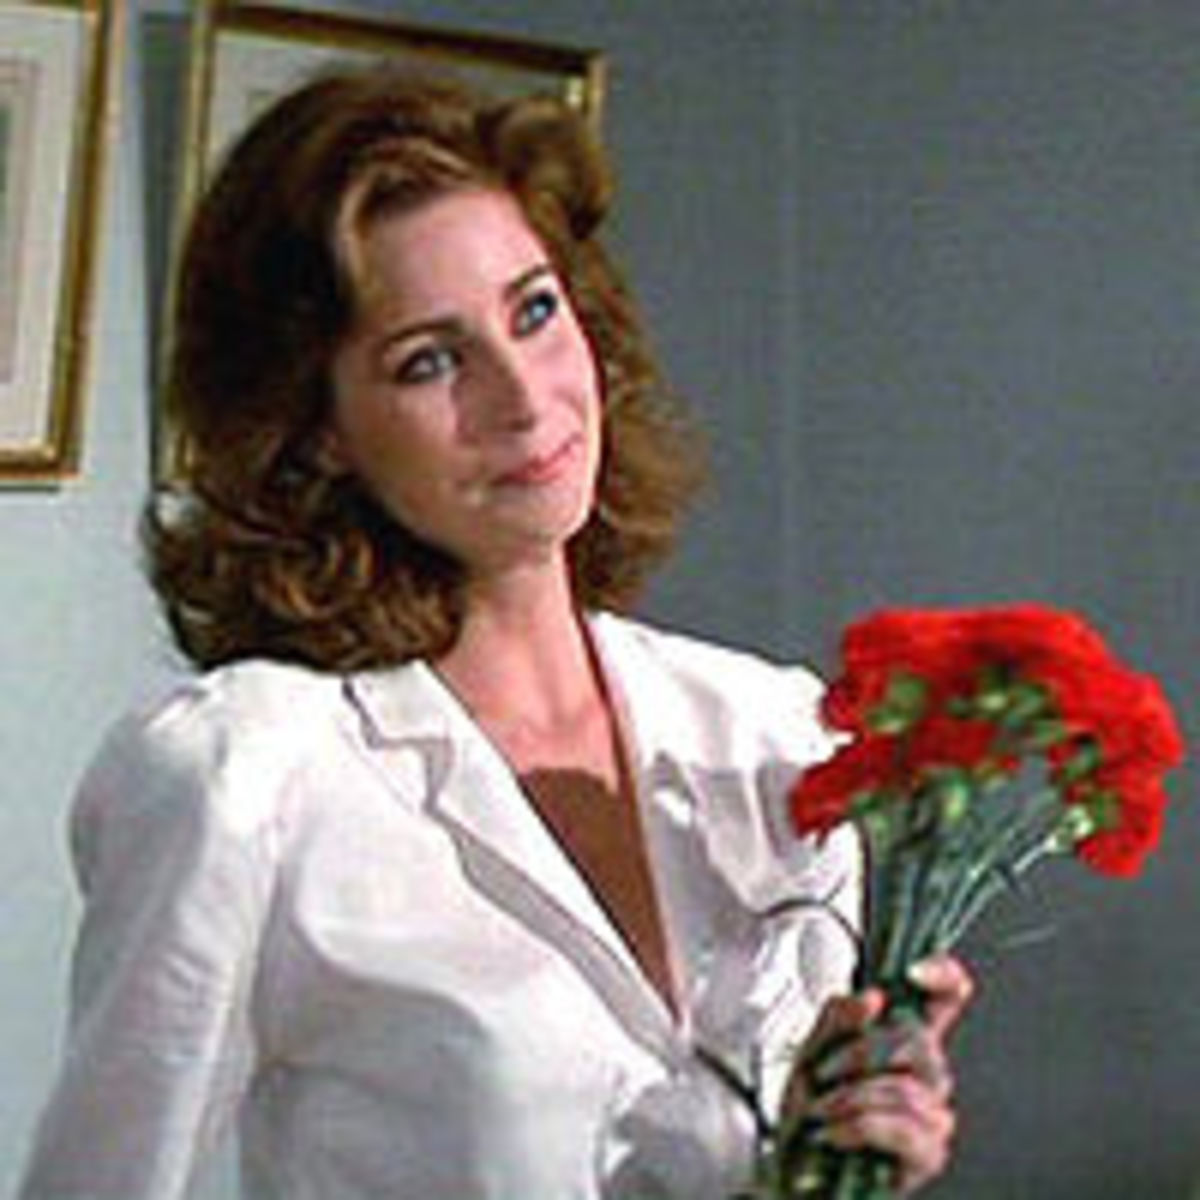 Michaela Clavell as Penelope Smallbone